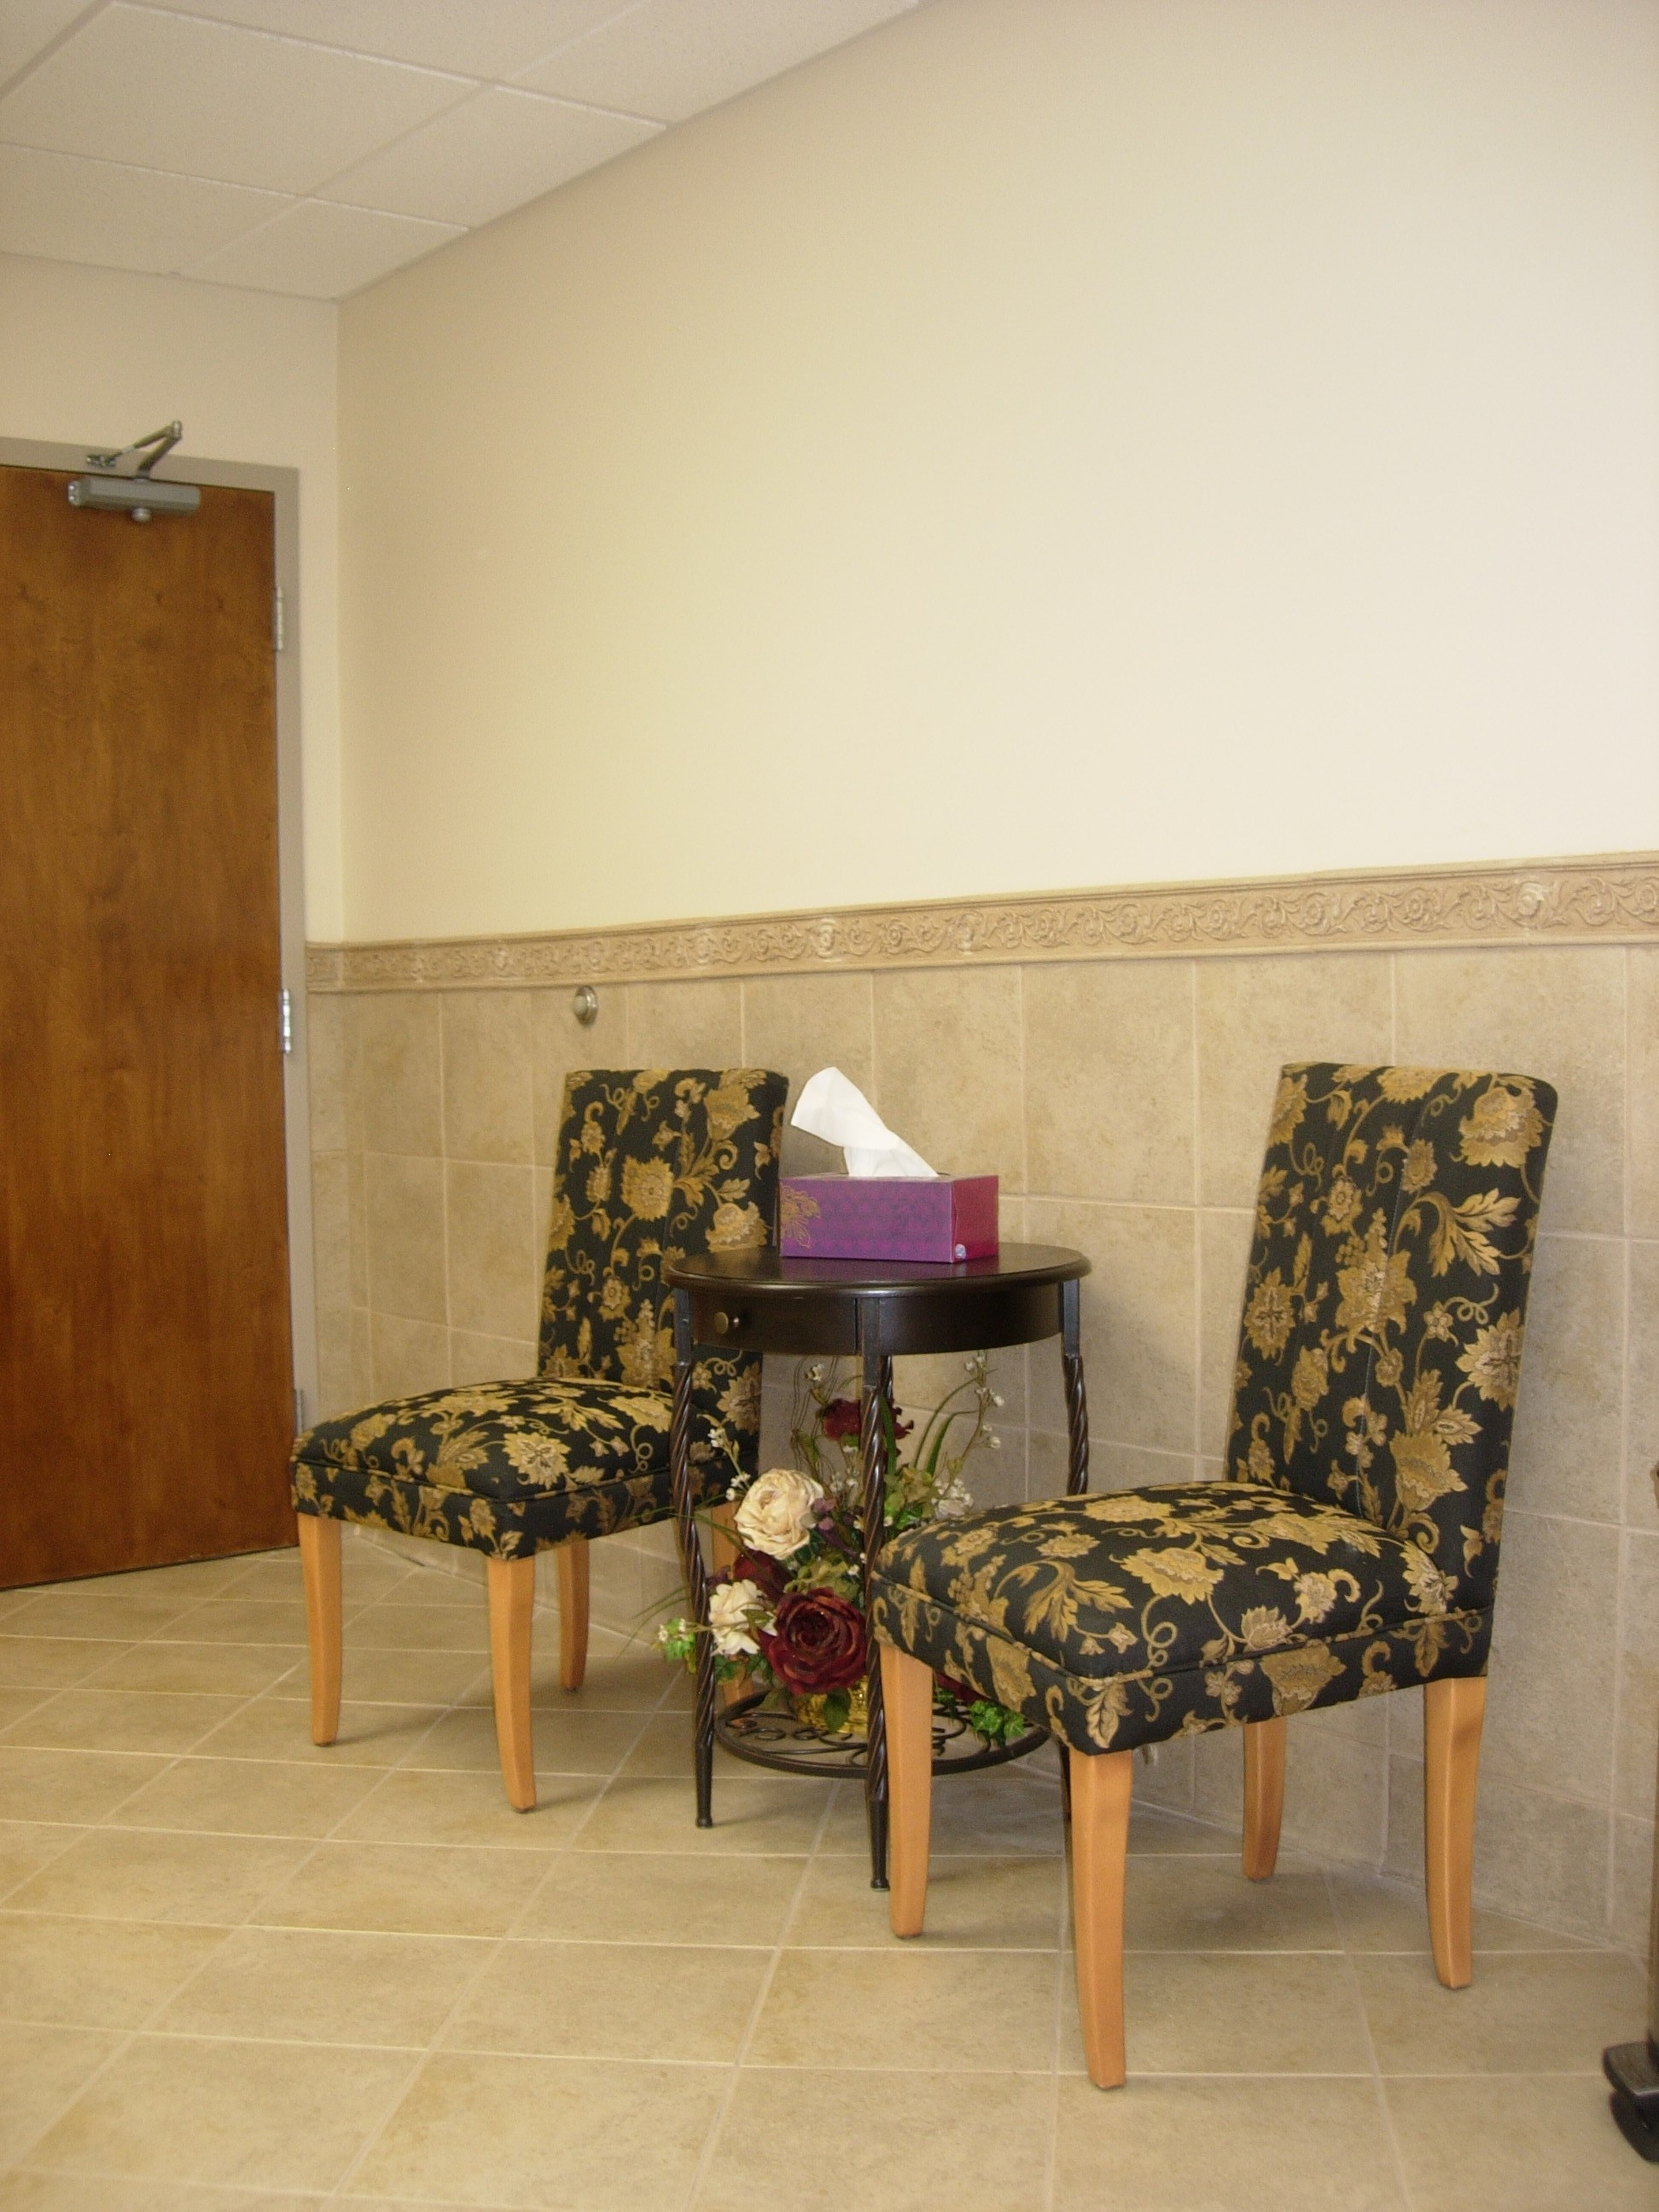 Grace Baptist Church Restroom Remodel Easterday